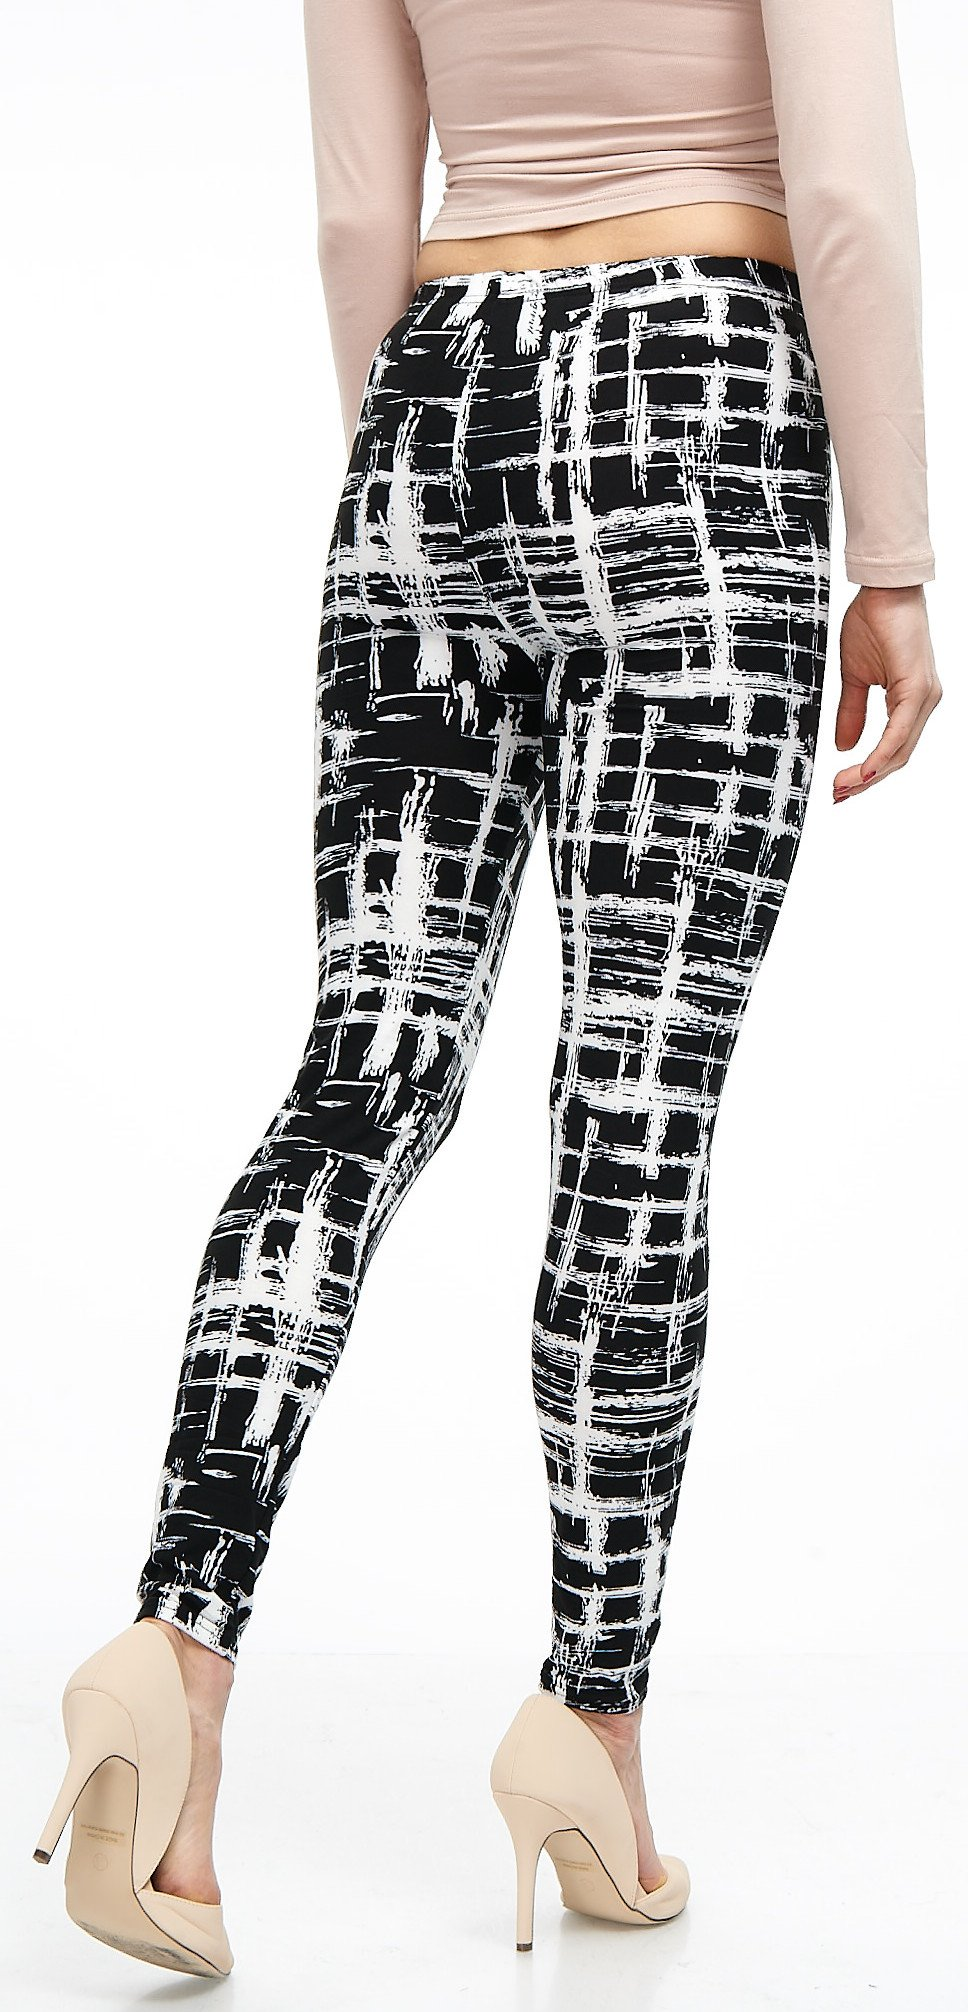 LMB Lush Moda Extra Soft Leggings with Designs- Variety of Prints - 720F Black White Stripes B5 by LMB (Image #7)